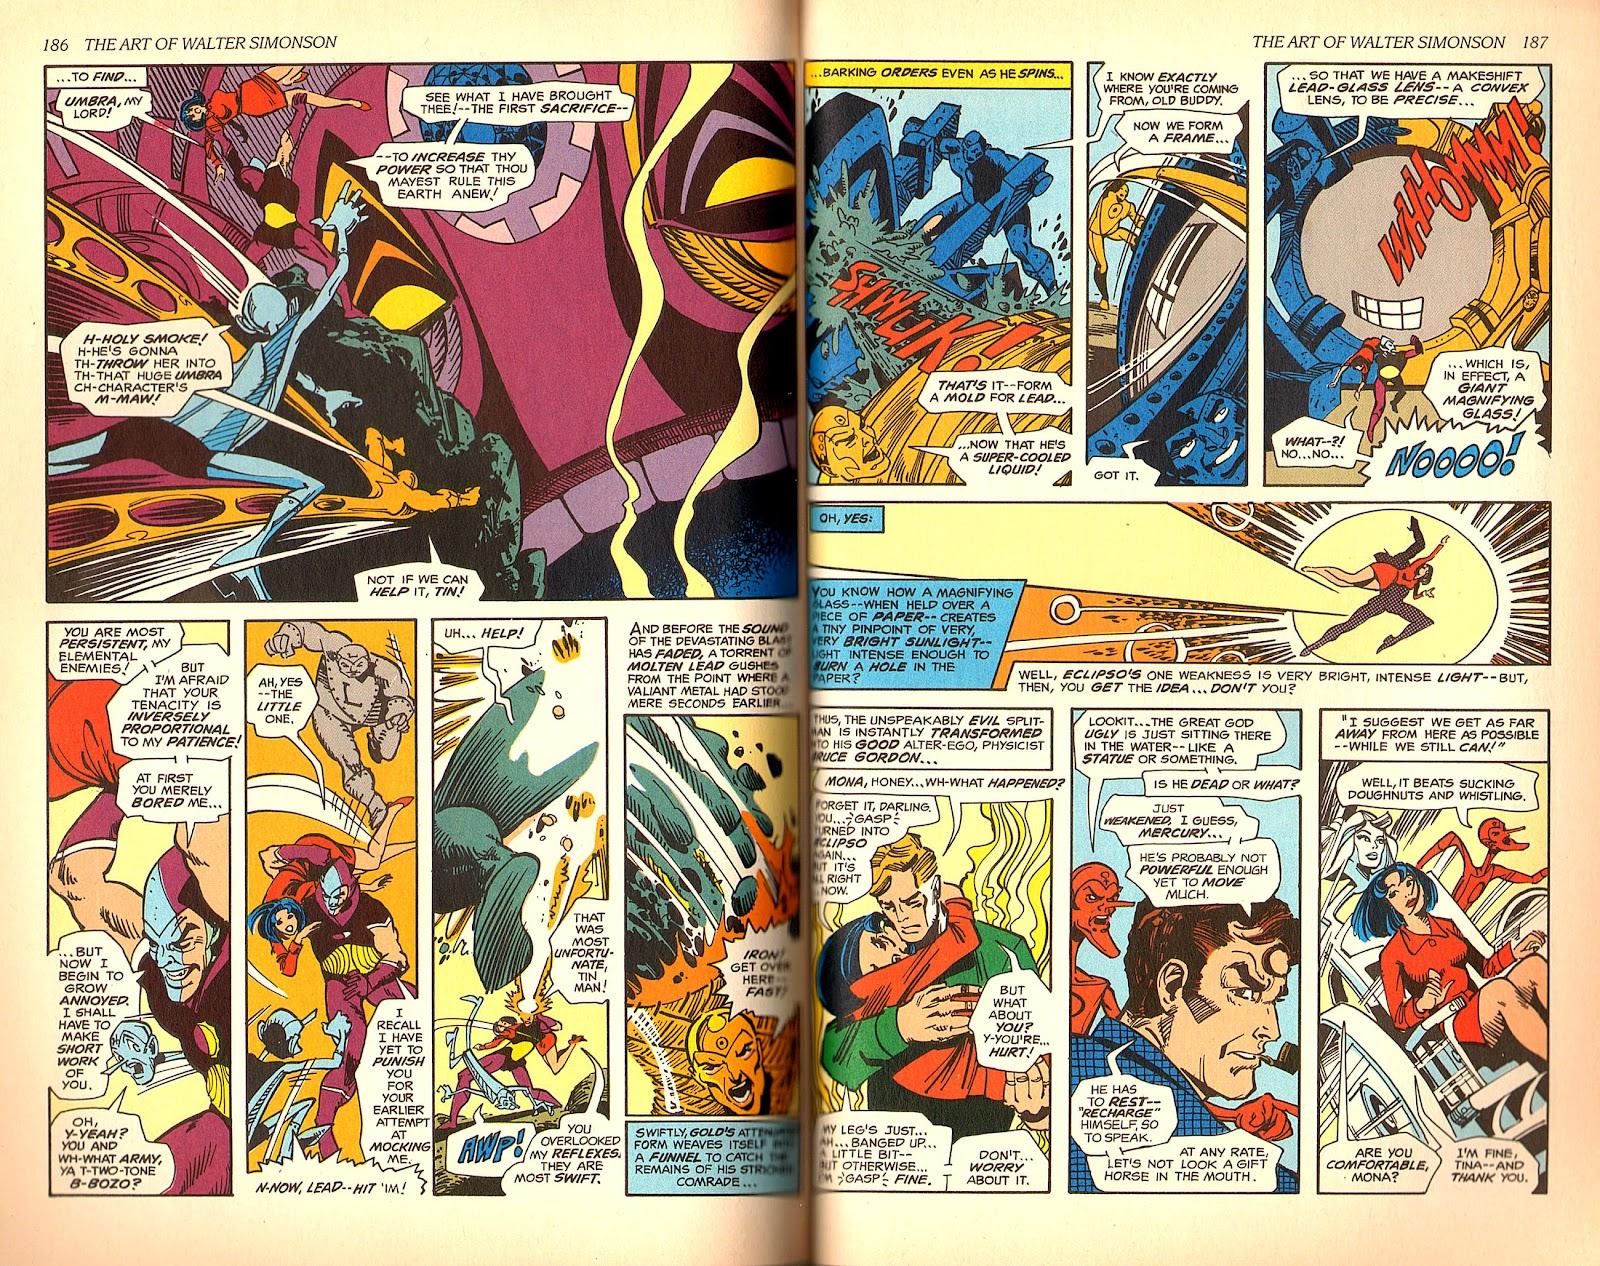 Read online The Art of Walter Simonson comic -  Issue # TPB - 95